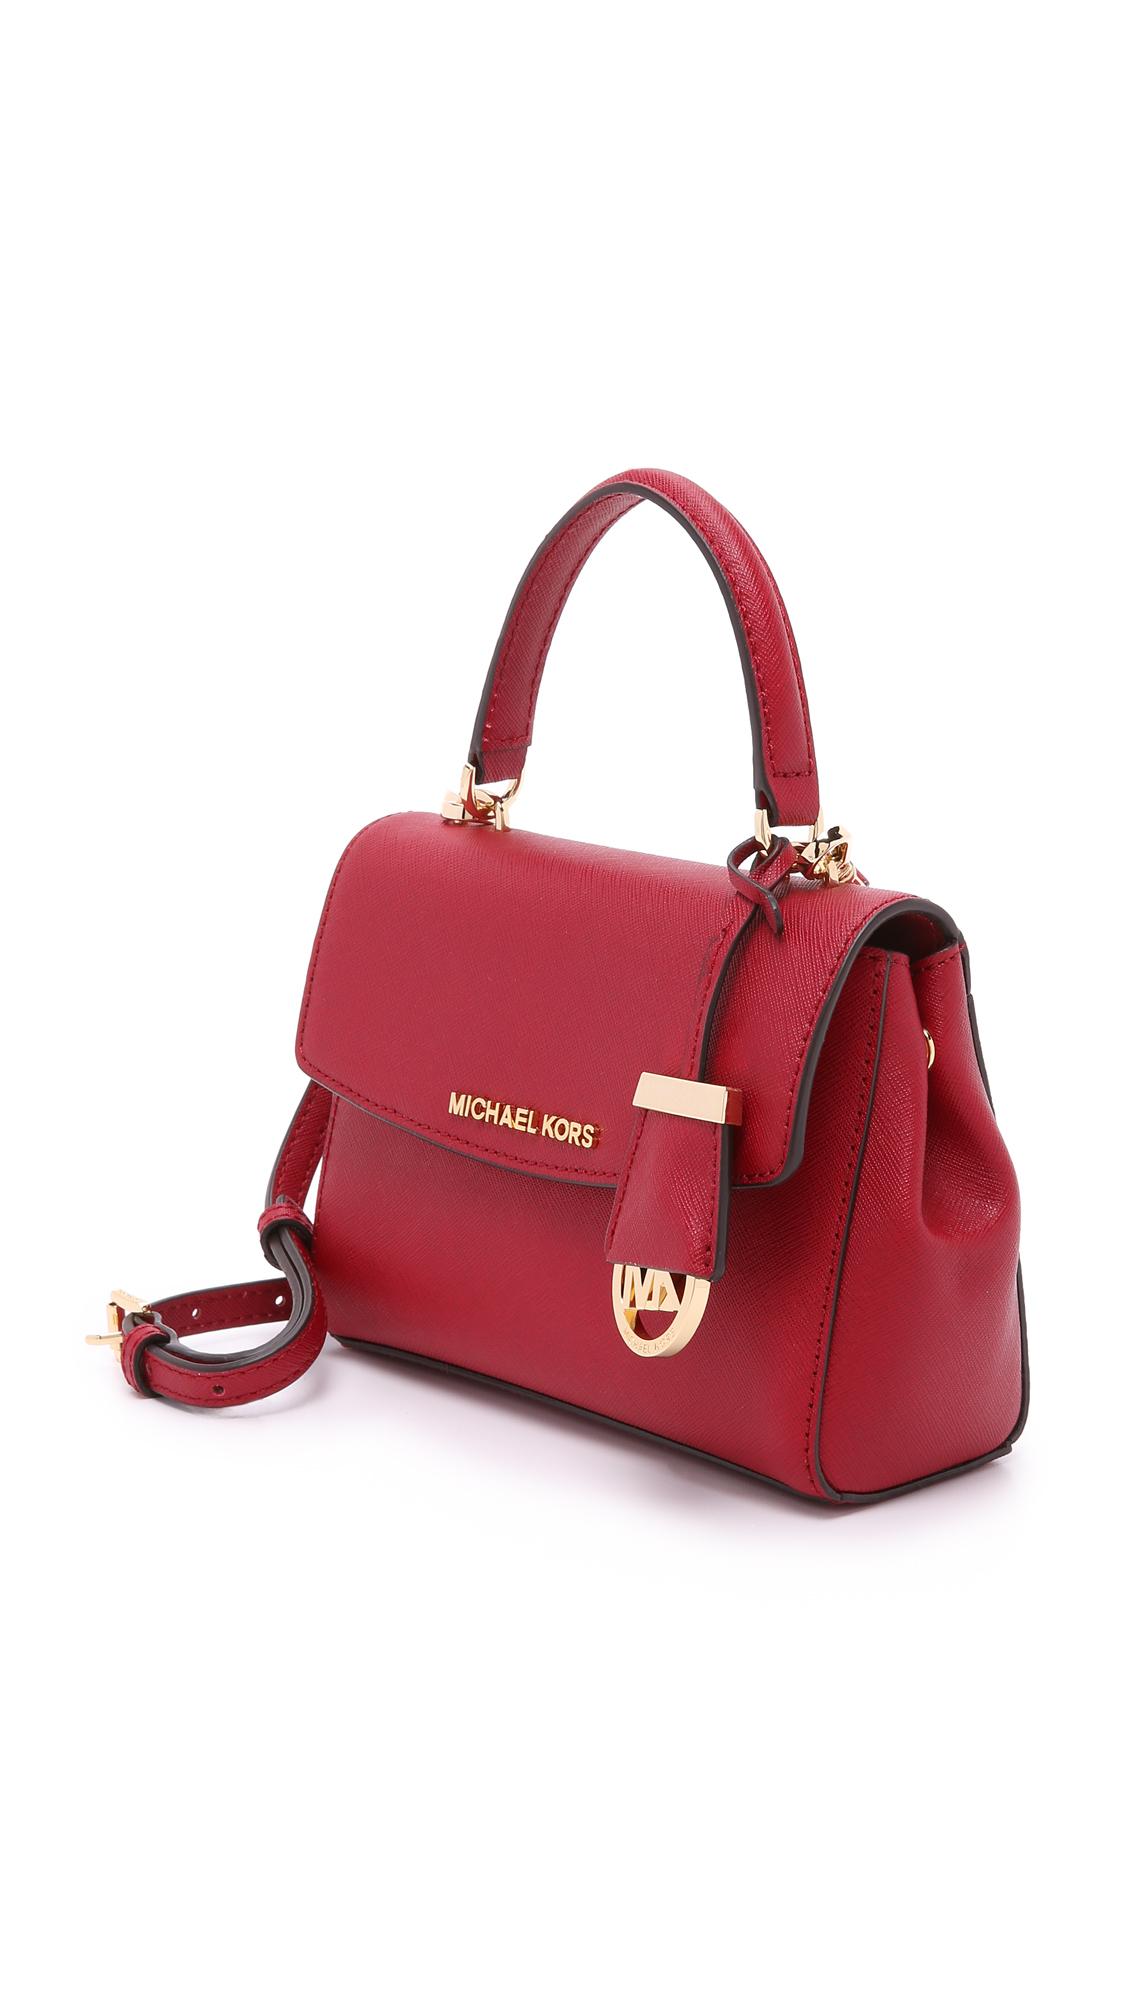 551a71398c46 Lyst - MICHAEL Michael Kors Ava Extra Small Cross Body Bag - Cherry ...